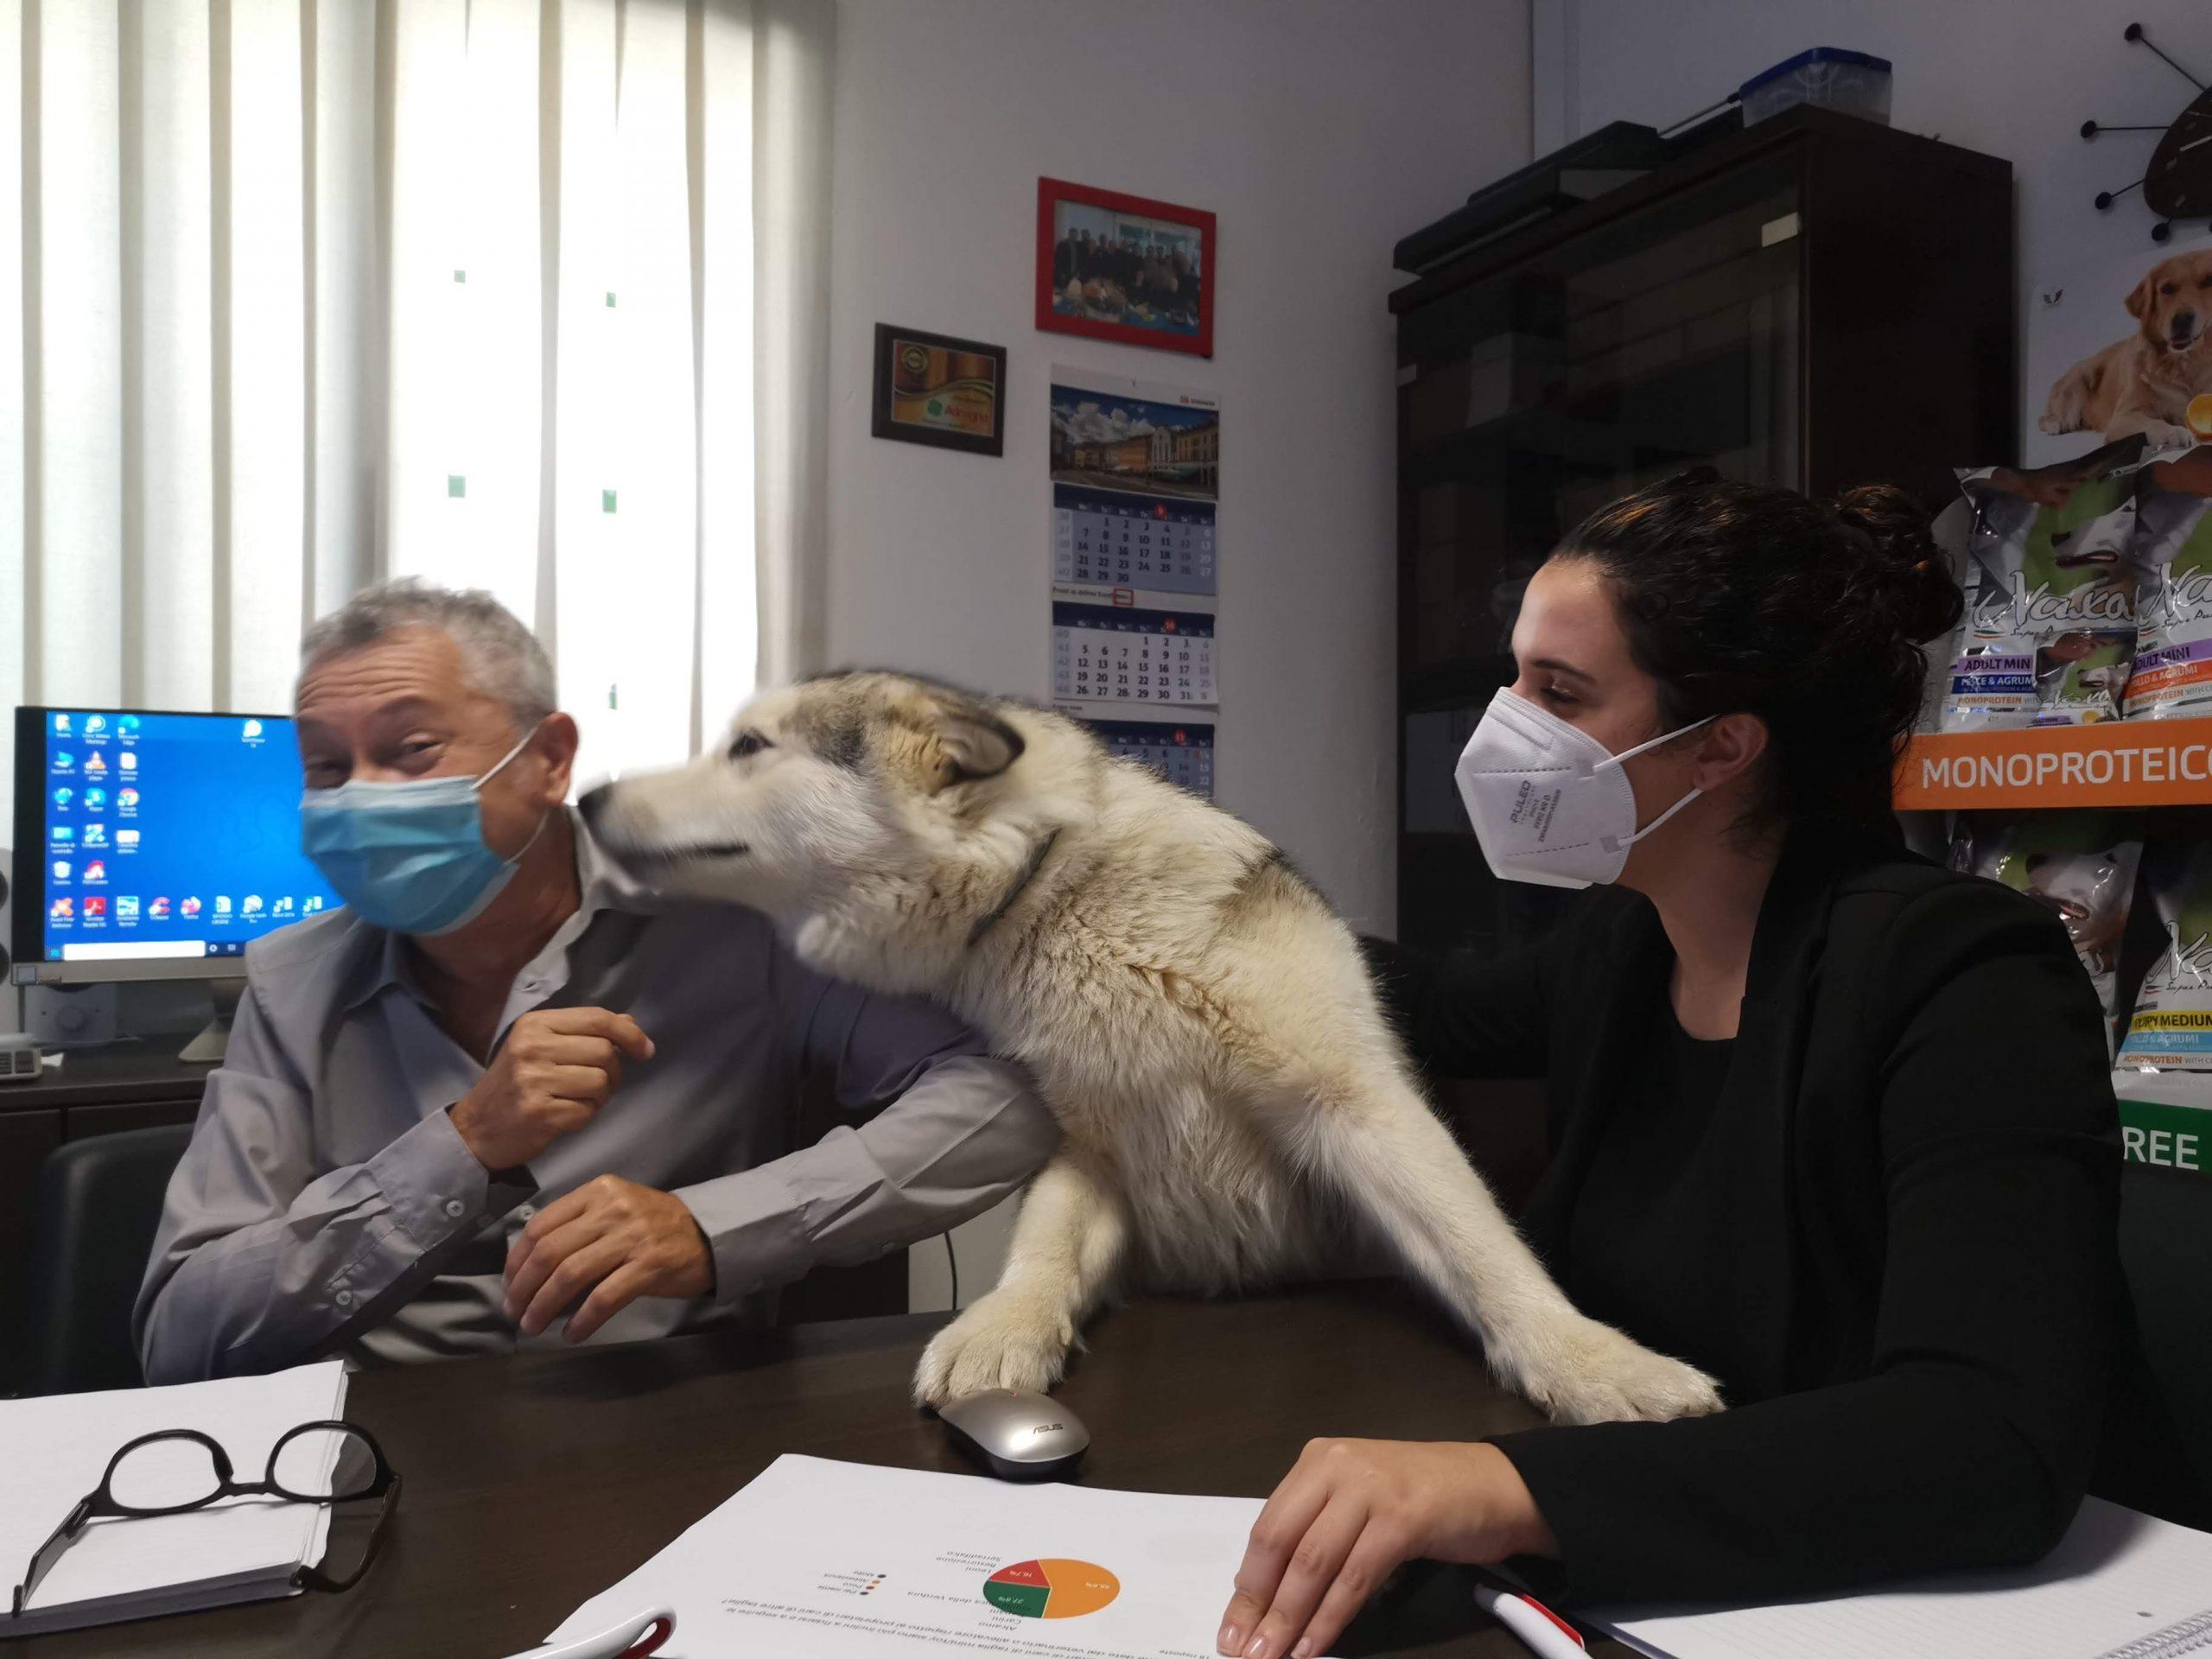 Sasha esprime la sua opinione durante un meeting interno